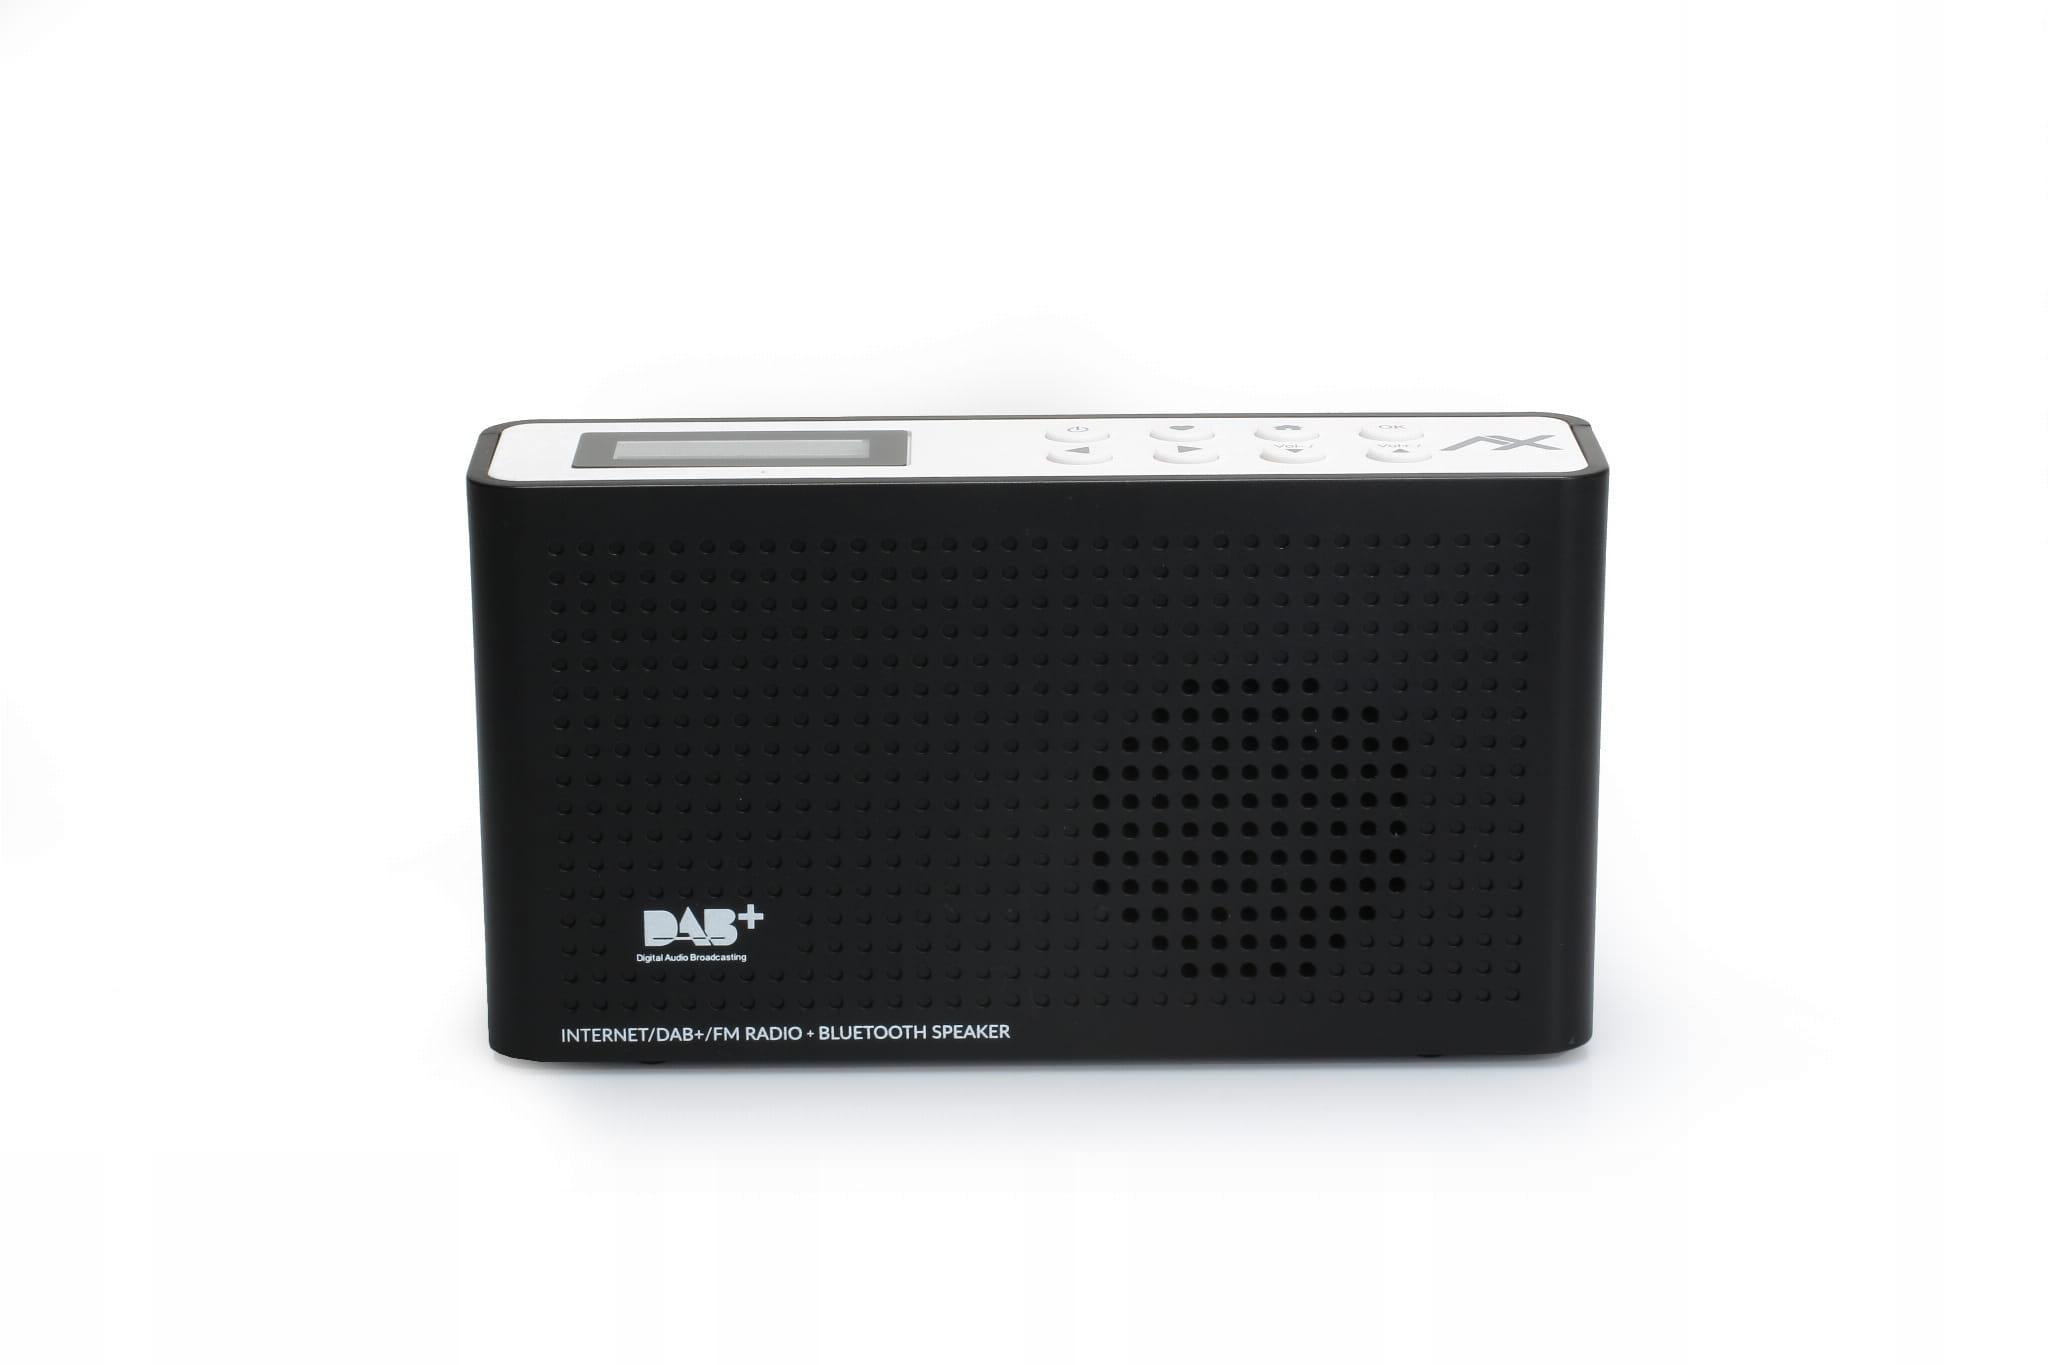 ELEGANCKIE RADIO KUCHENNE INTERNETOWE DAB FM WIFI